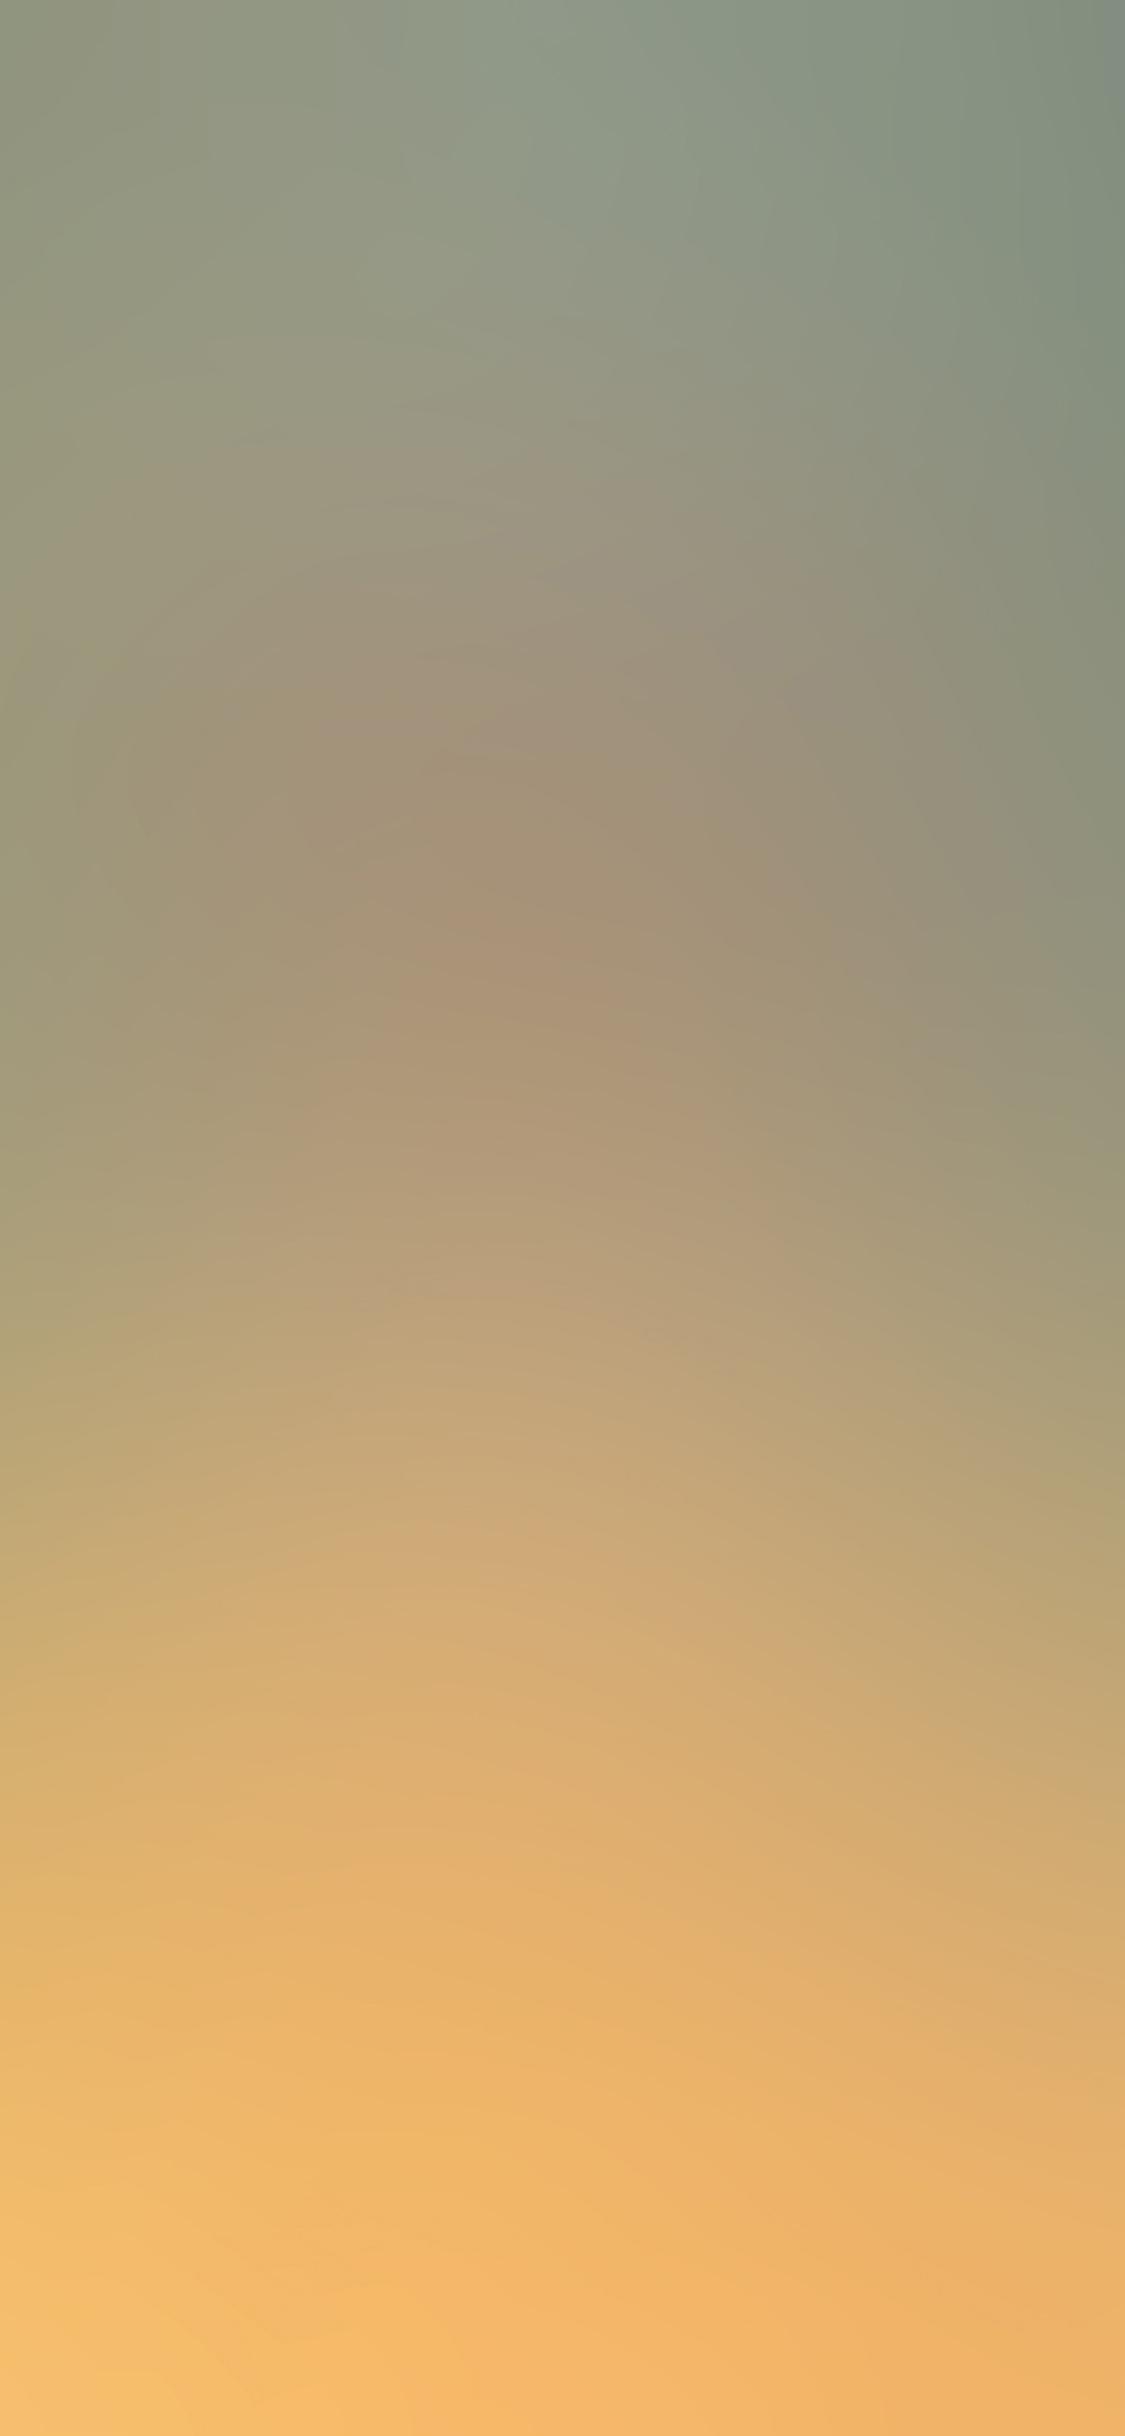 iPhoneXpapers.com-Apple-iPhone-wallpaper-sa71-wallpaper-field-blur